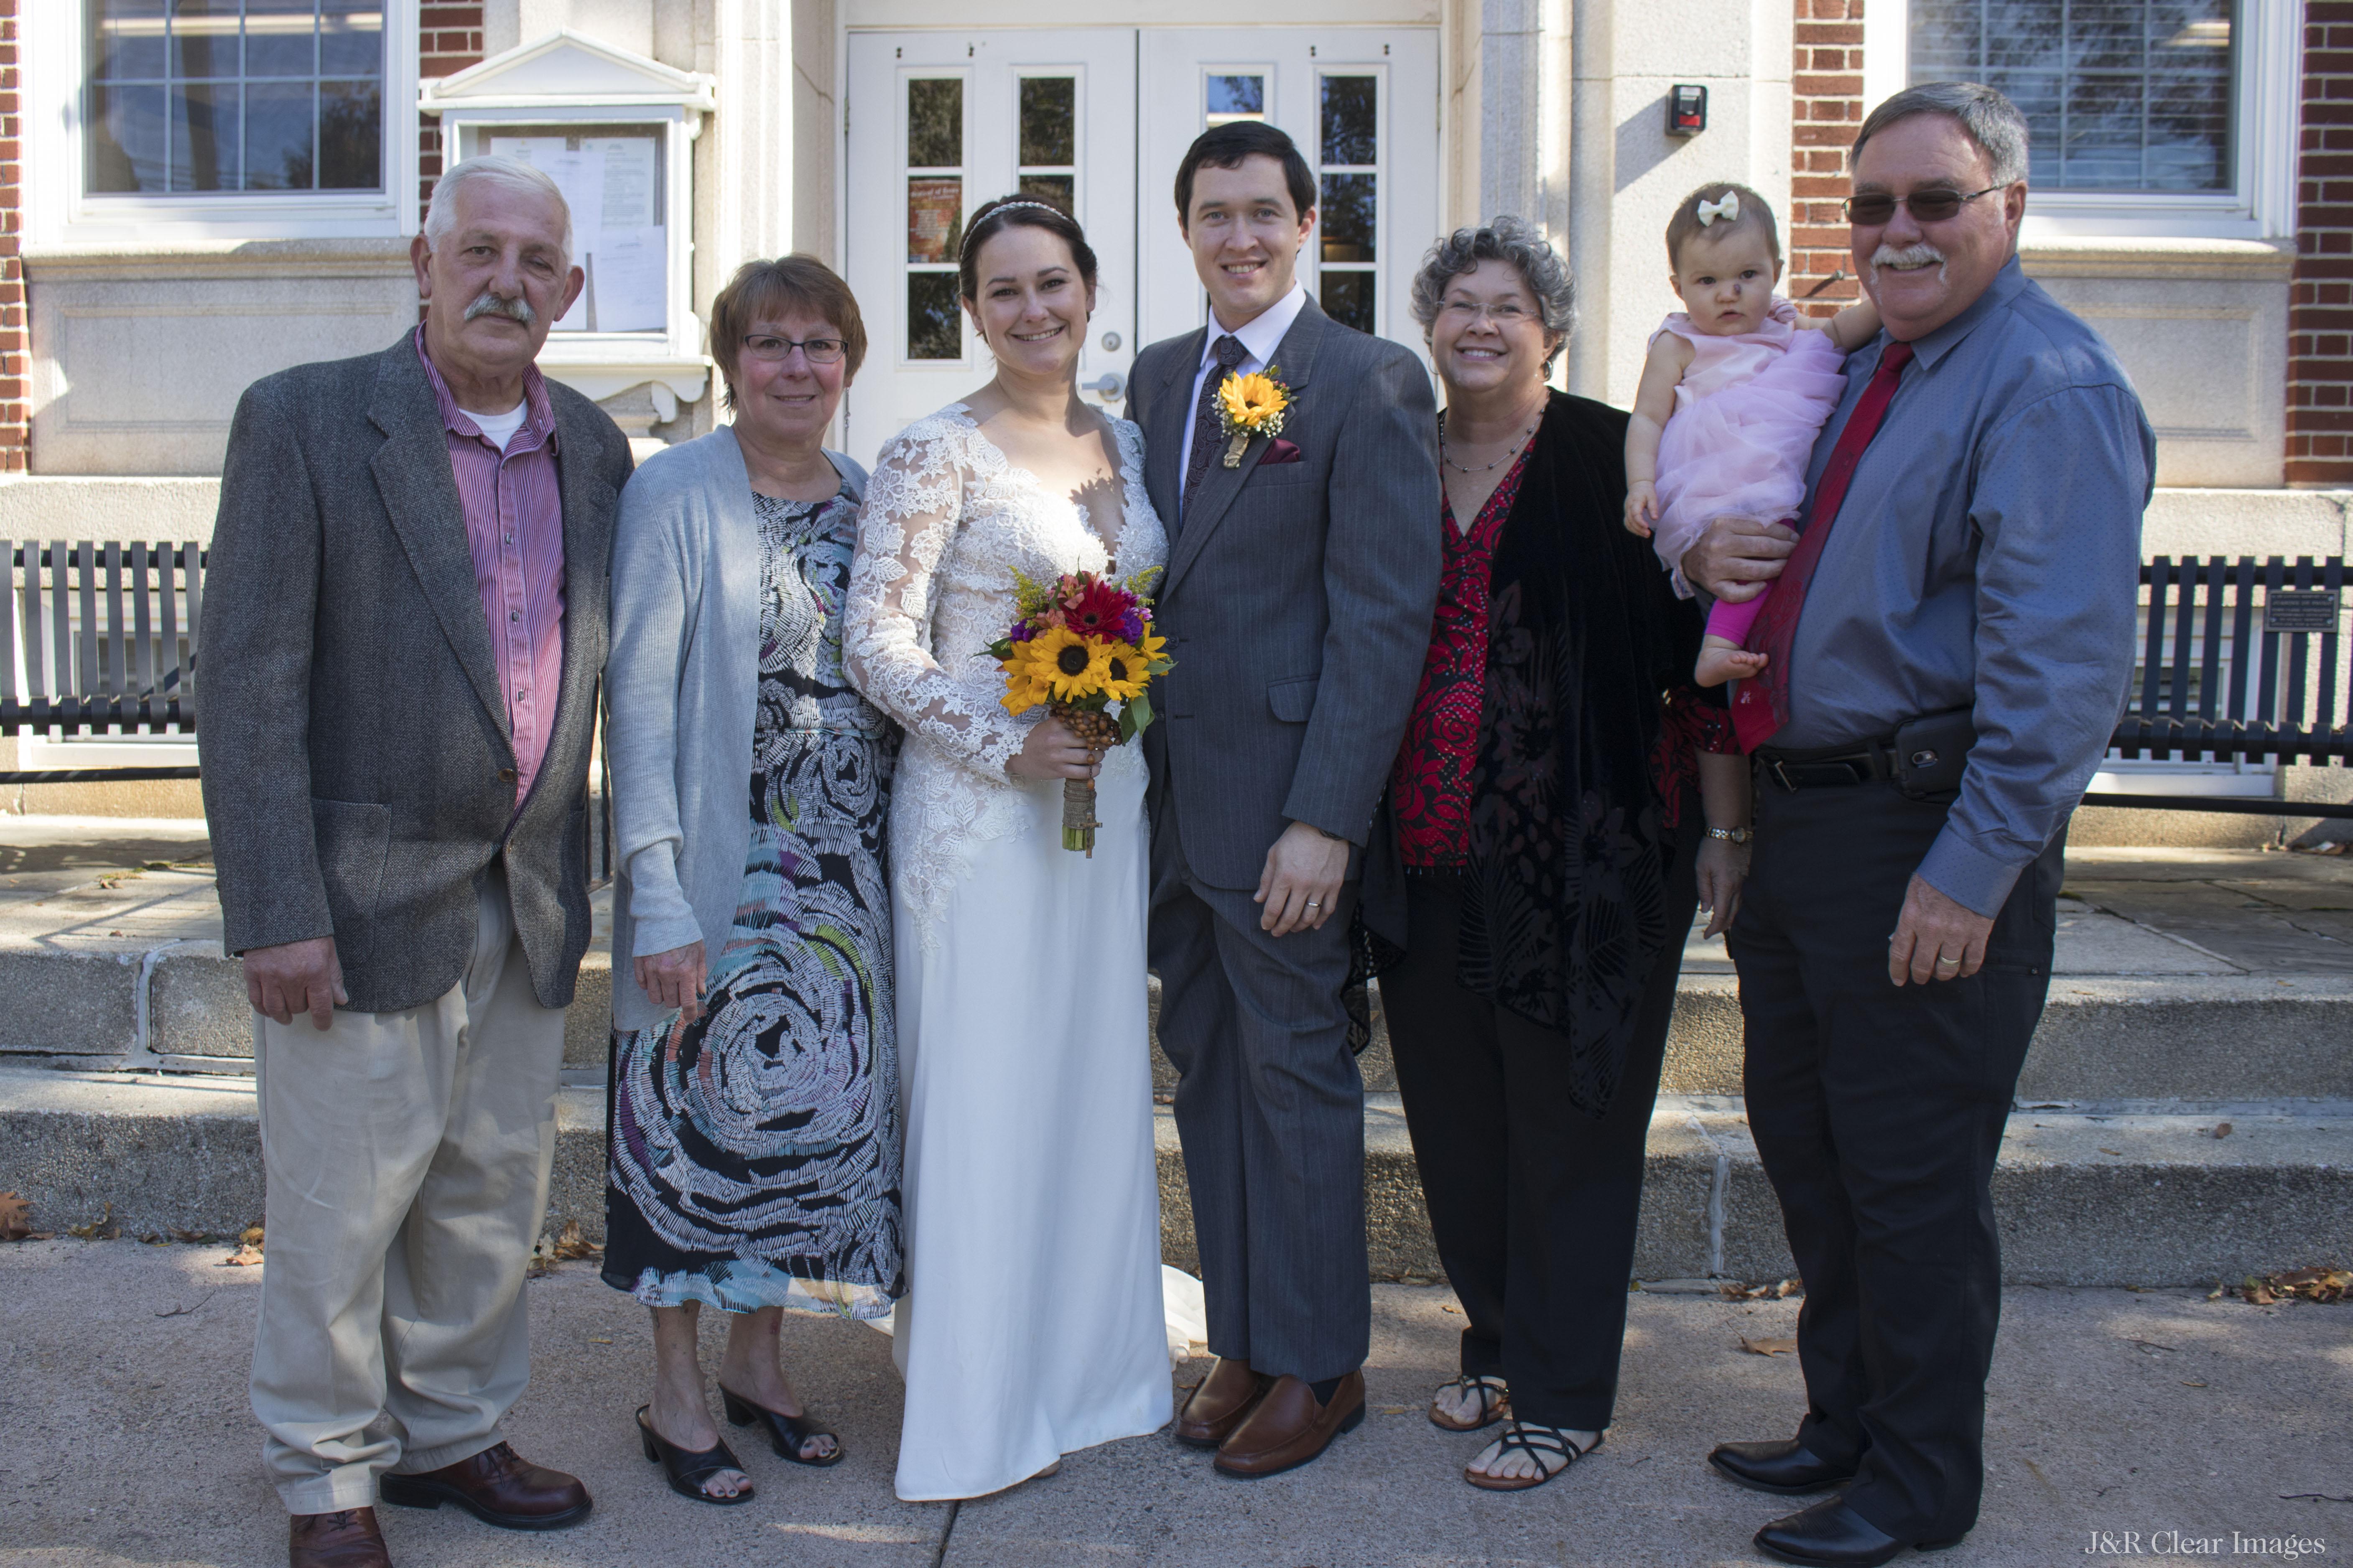 Family_BrideGroom_Parents